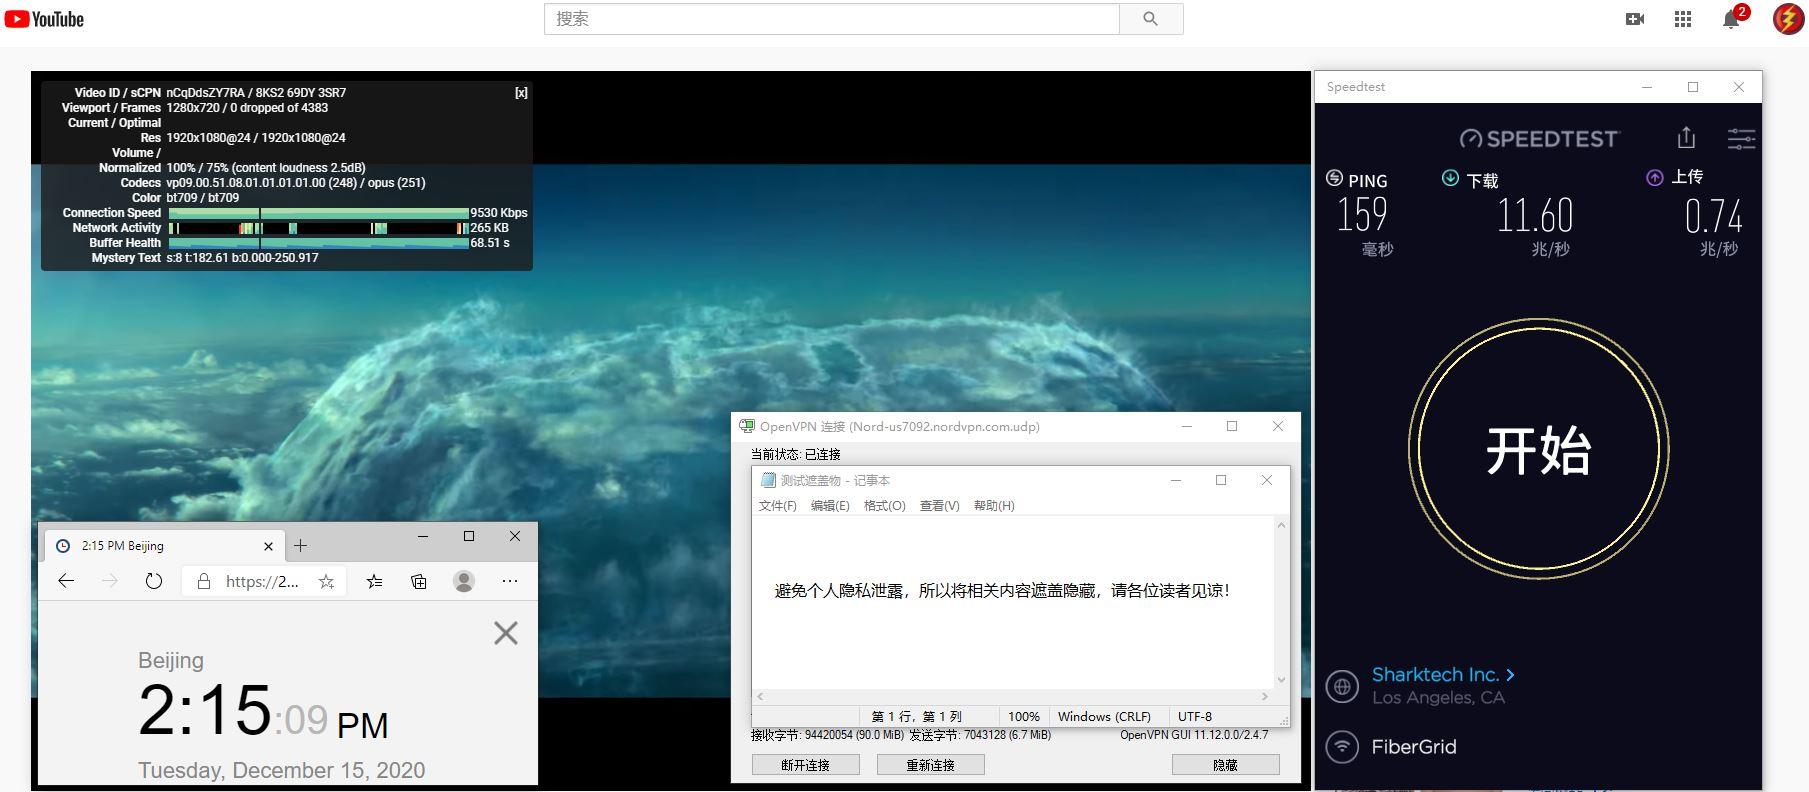 Windows10 NordVPN OpenVPN Gui US7092 服务器 中国VPN 翻墙 科学上网 测试 - 20201215